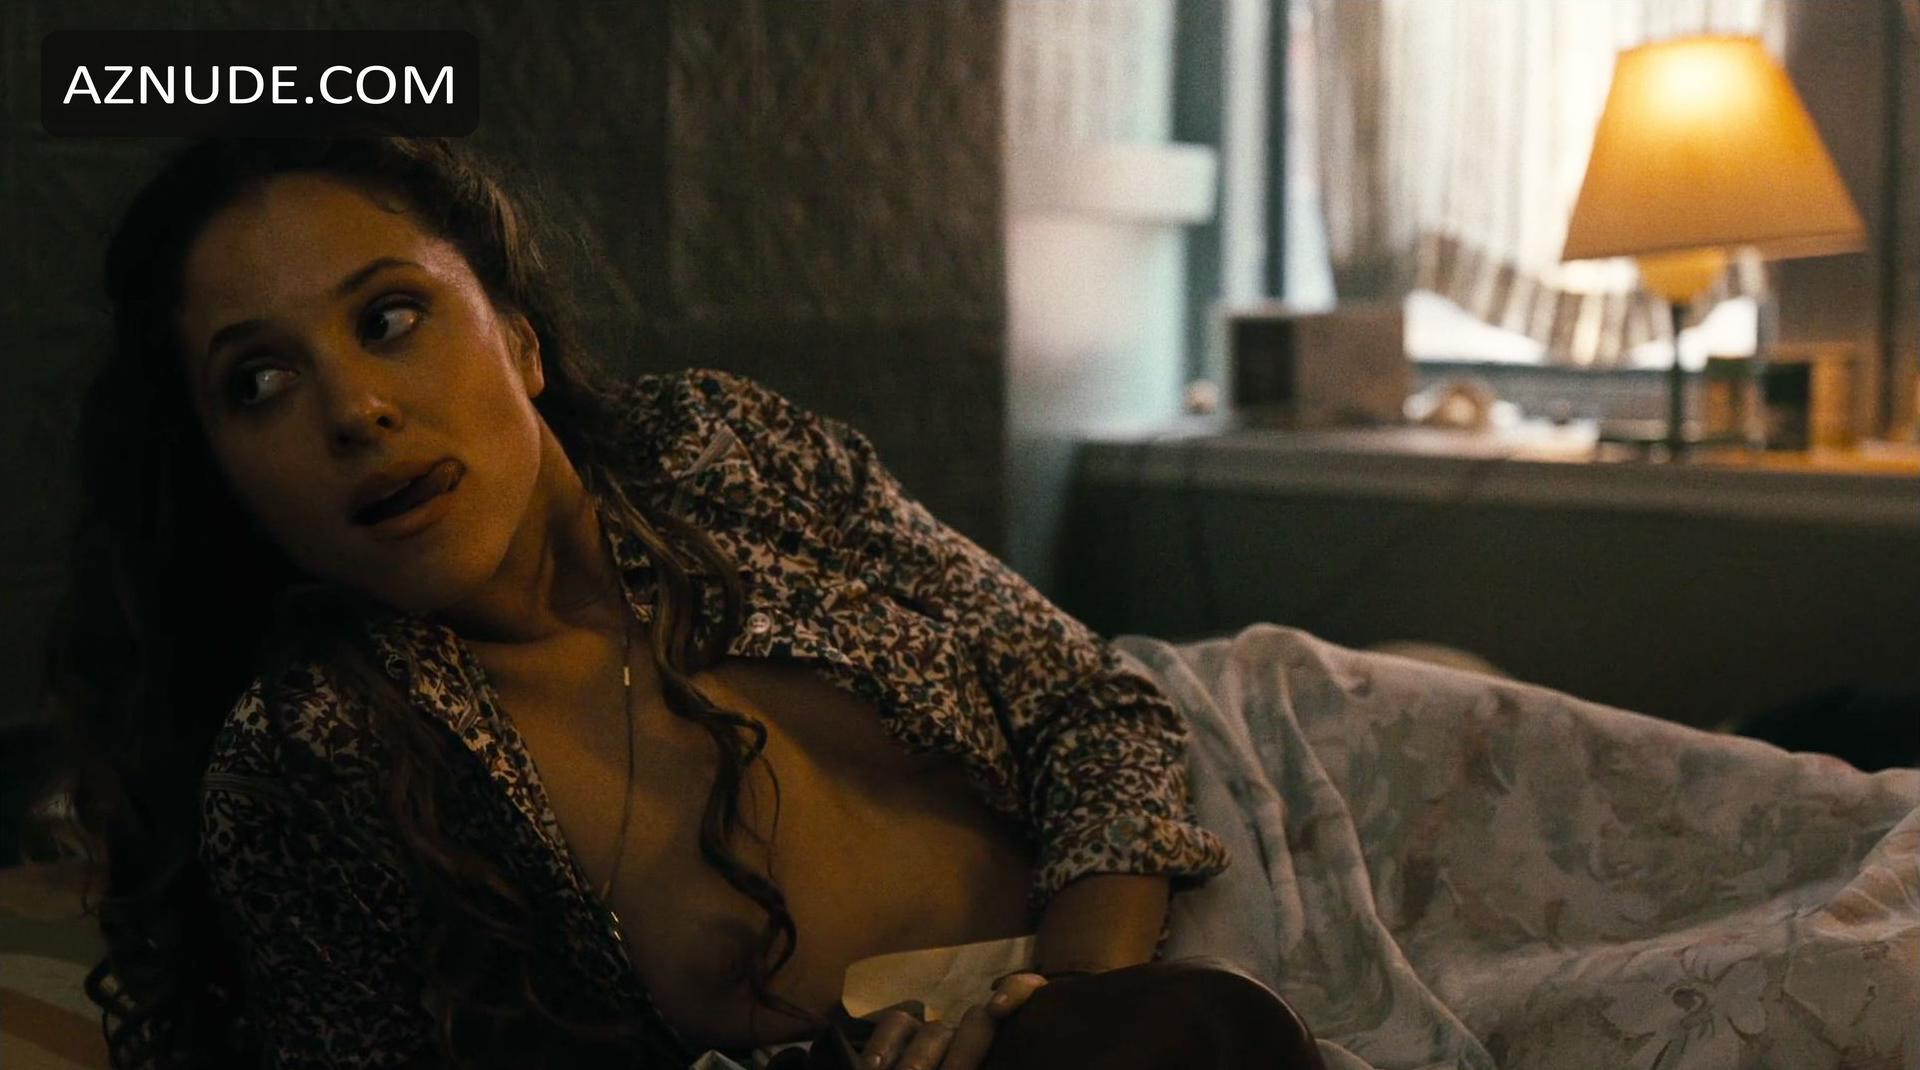 One lucky margarita levieva nude pics